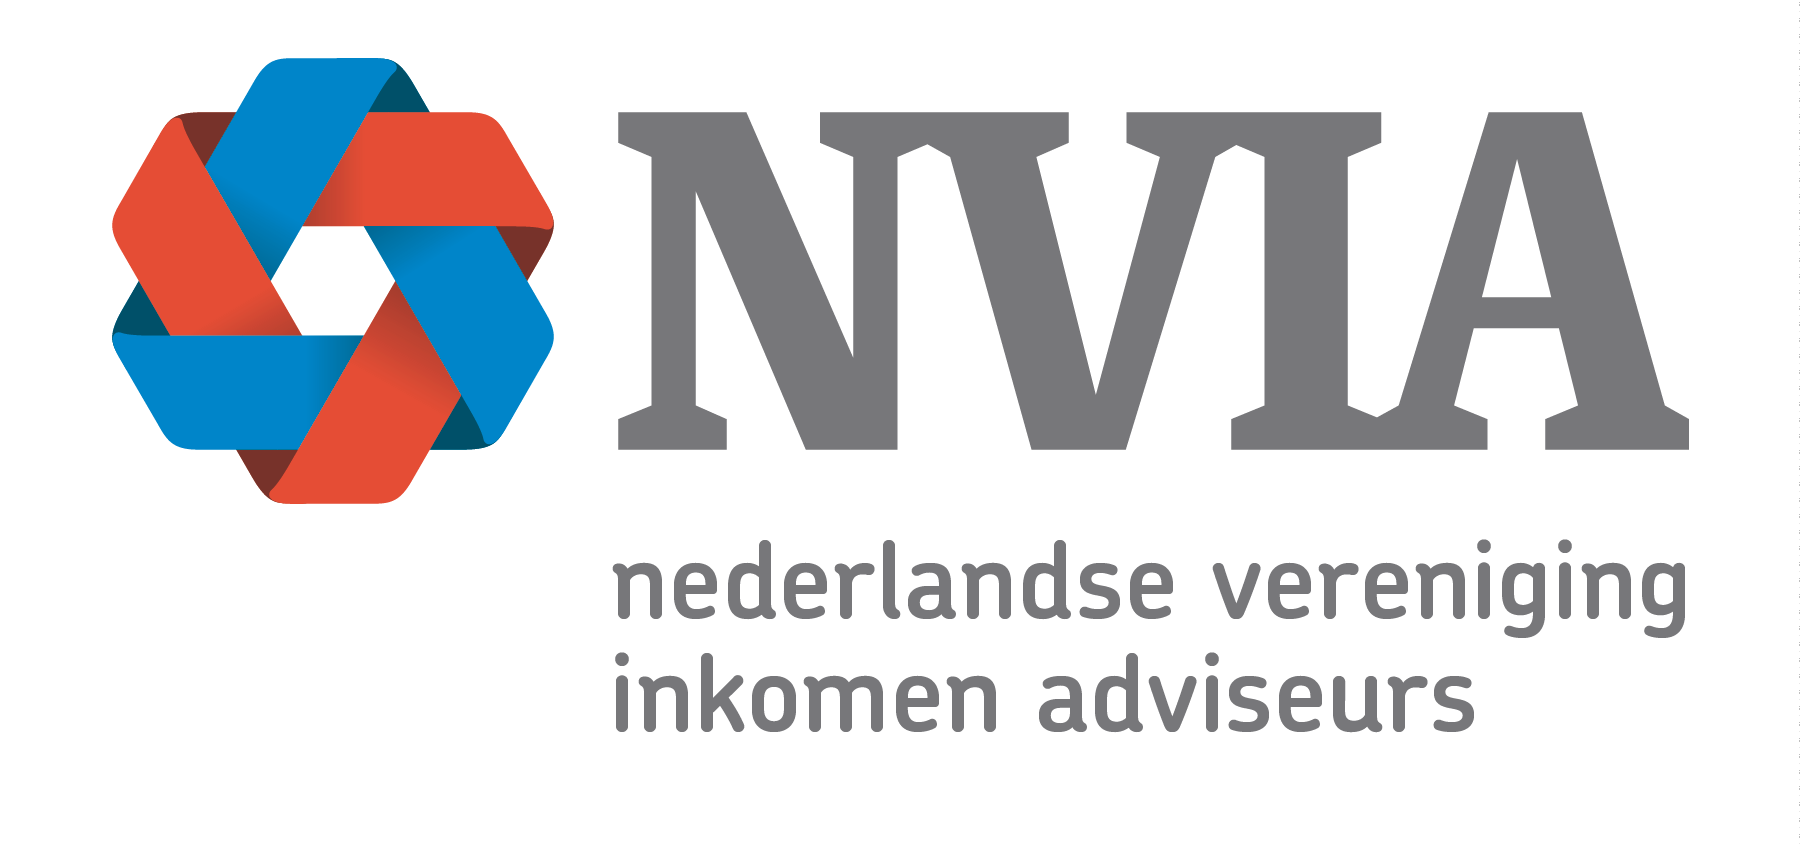 NVIA: Nederlandse Vereniging Inkomen Adviseurs